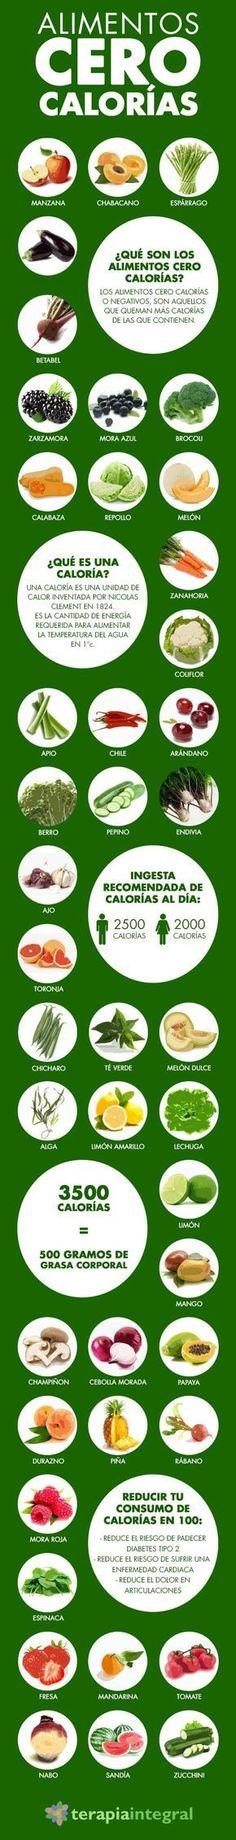 42 alimentos con cero calorías. #nutrición #salud #infografía Pinterest ;) | https://pinterest.com/cocinadosiemp